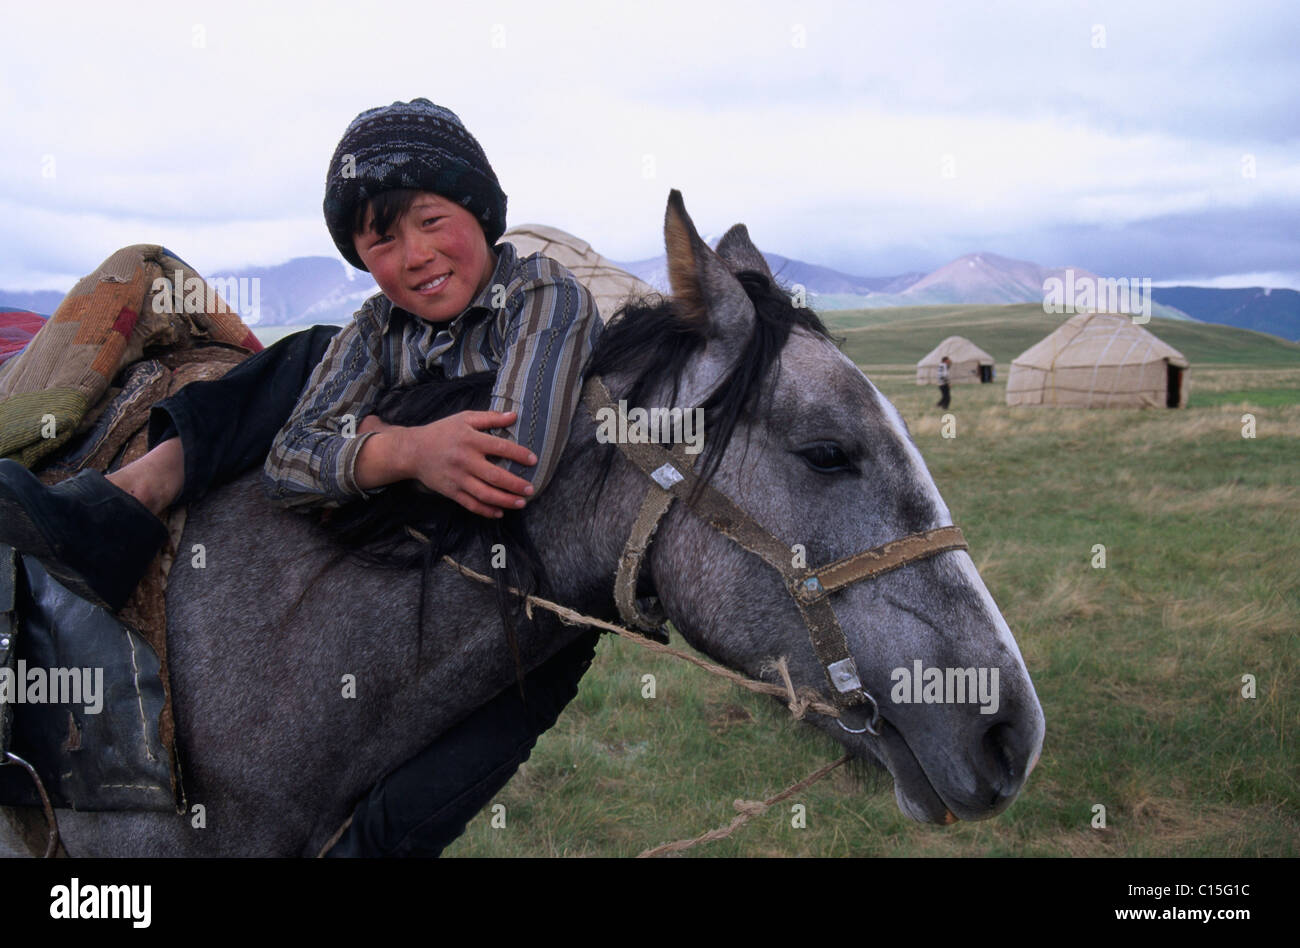 Boy and horse at Lake Song Kul, Kyrgyzstan, Central Asia - Stock Image